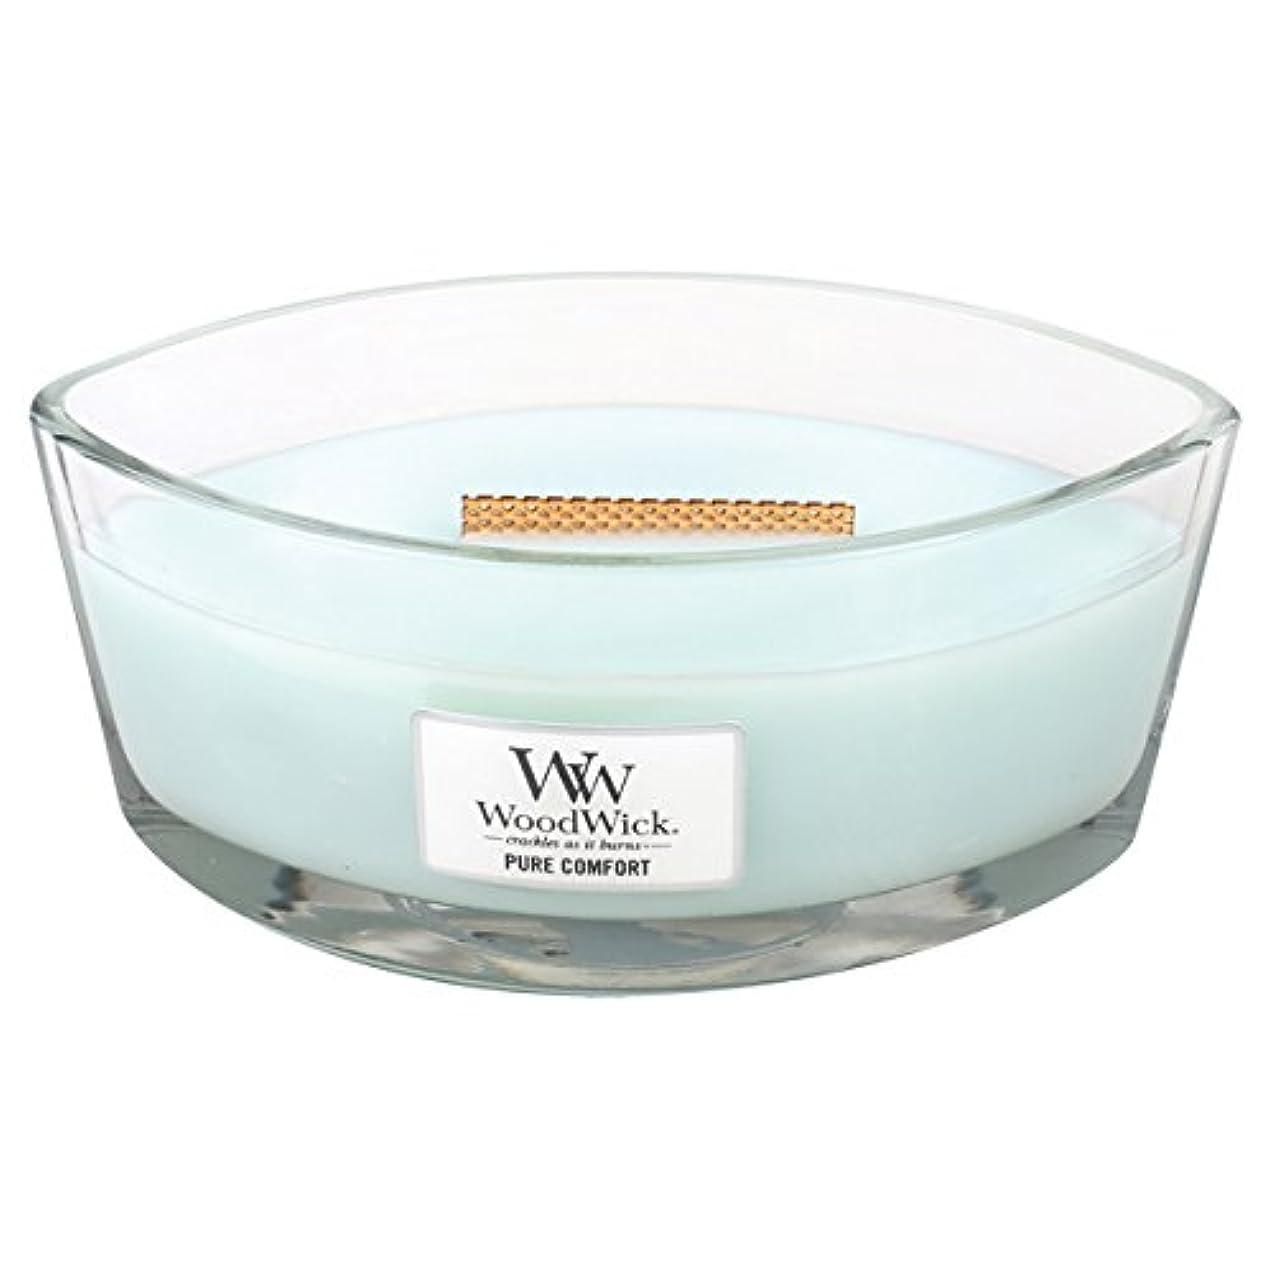 Wood Wick ハースウィックL 「 ピュアコンフォート 」 キャンドル W940053027